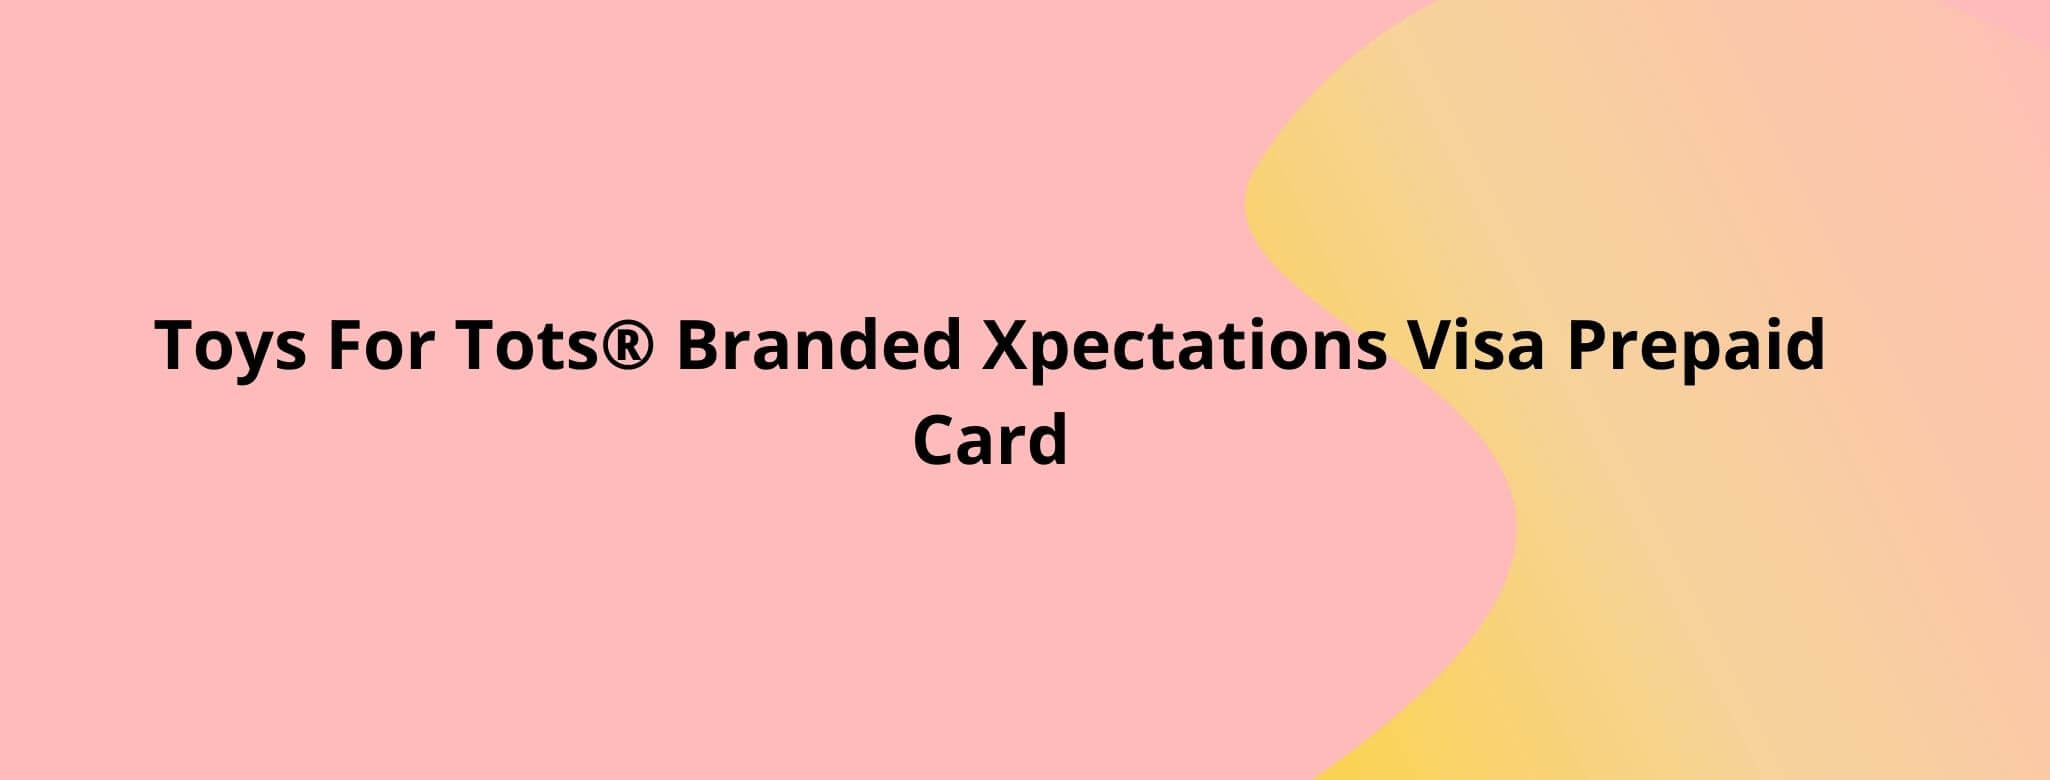 Pls card